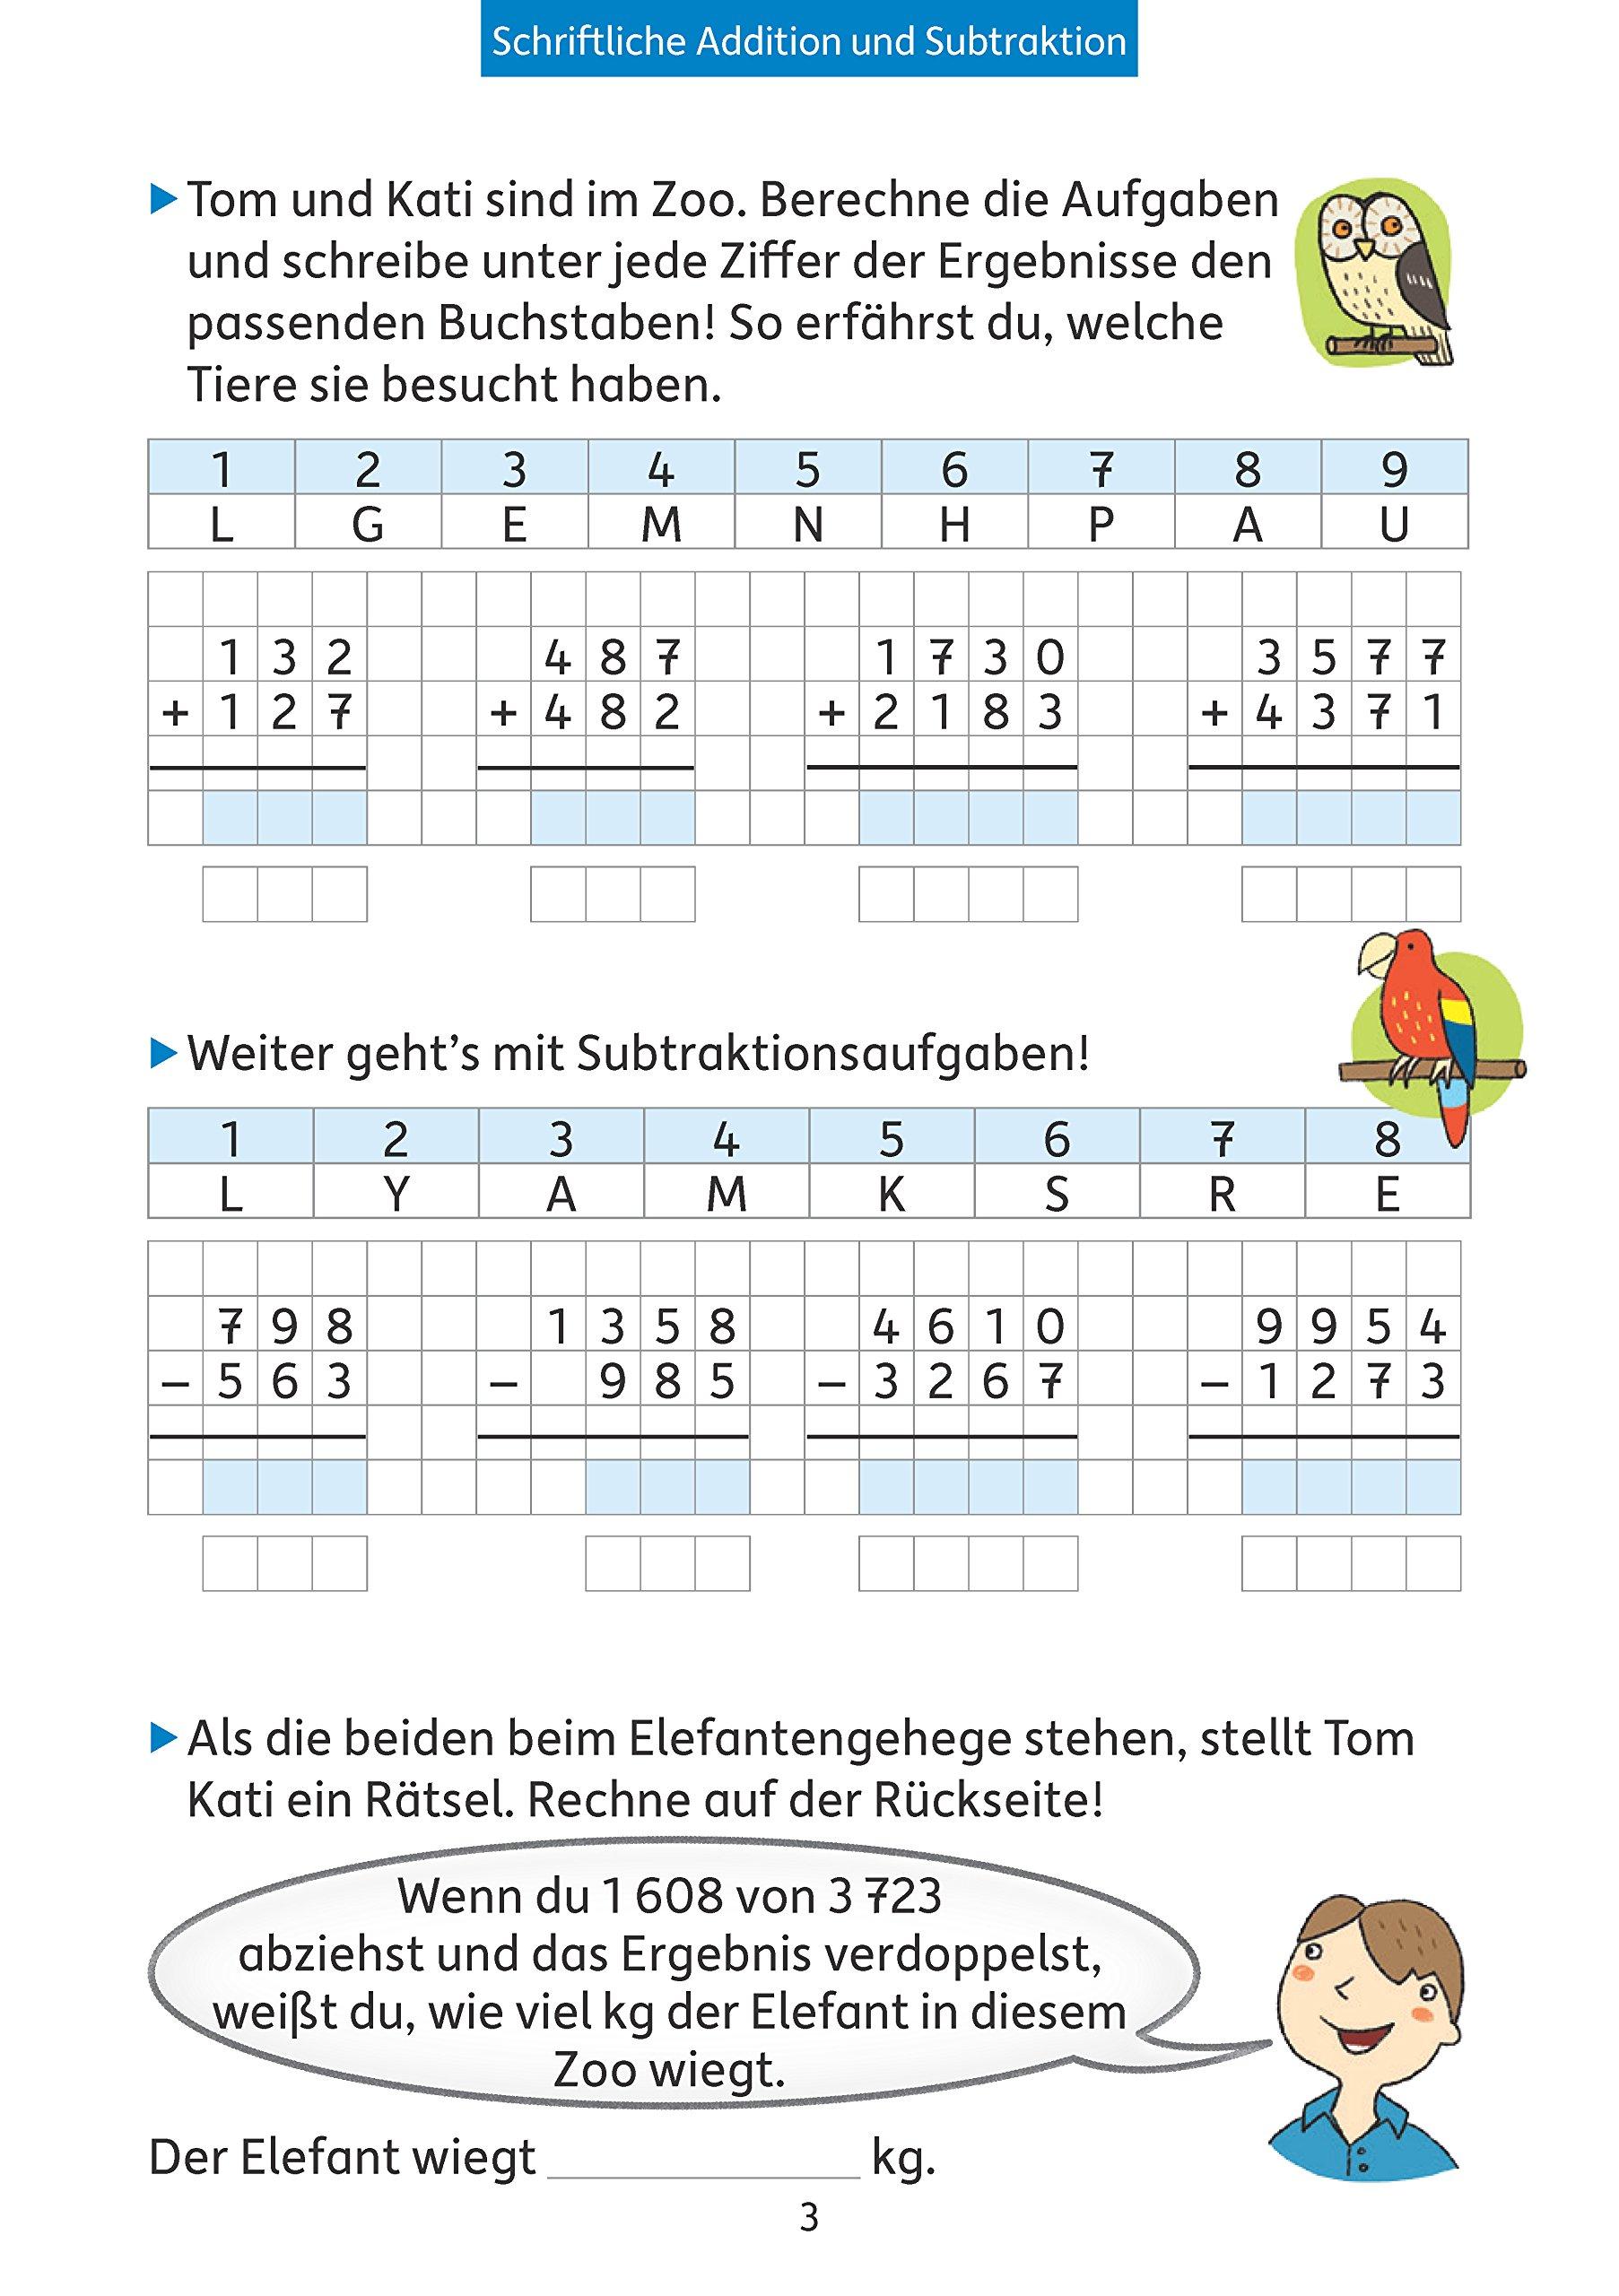 Fantastisch Genre Arbeitsblatt Zeitgenössisch - Arbeitsblatt Schule ...